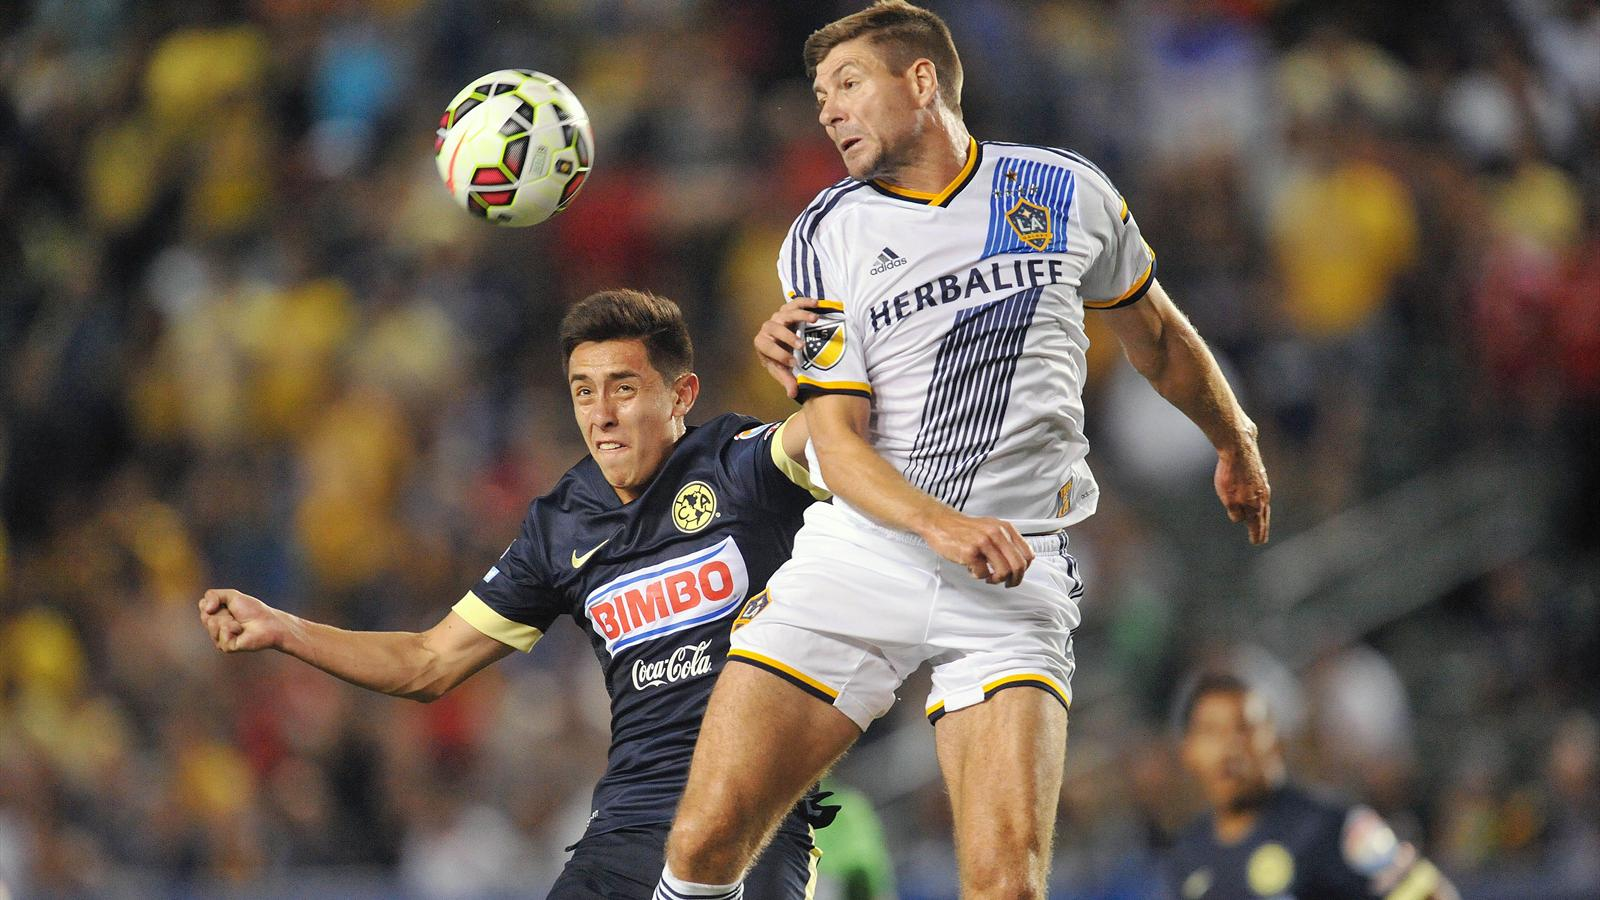 Los Angeles Galaxy midfielder Steven Gerrard (8) plays for the ball against Club America midfielder Francisco Rivera (26)